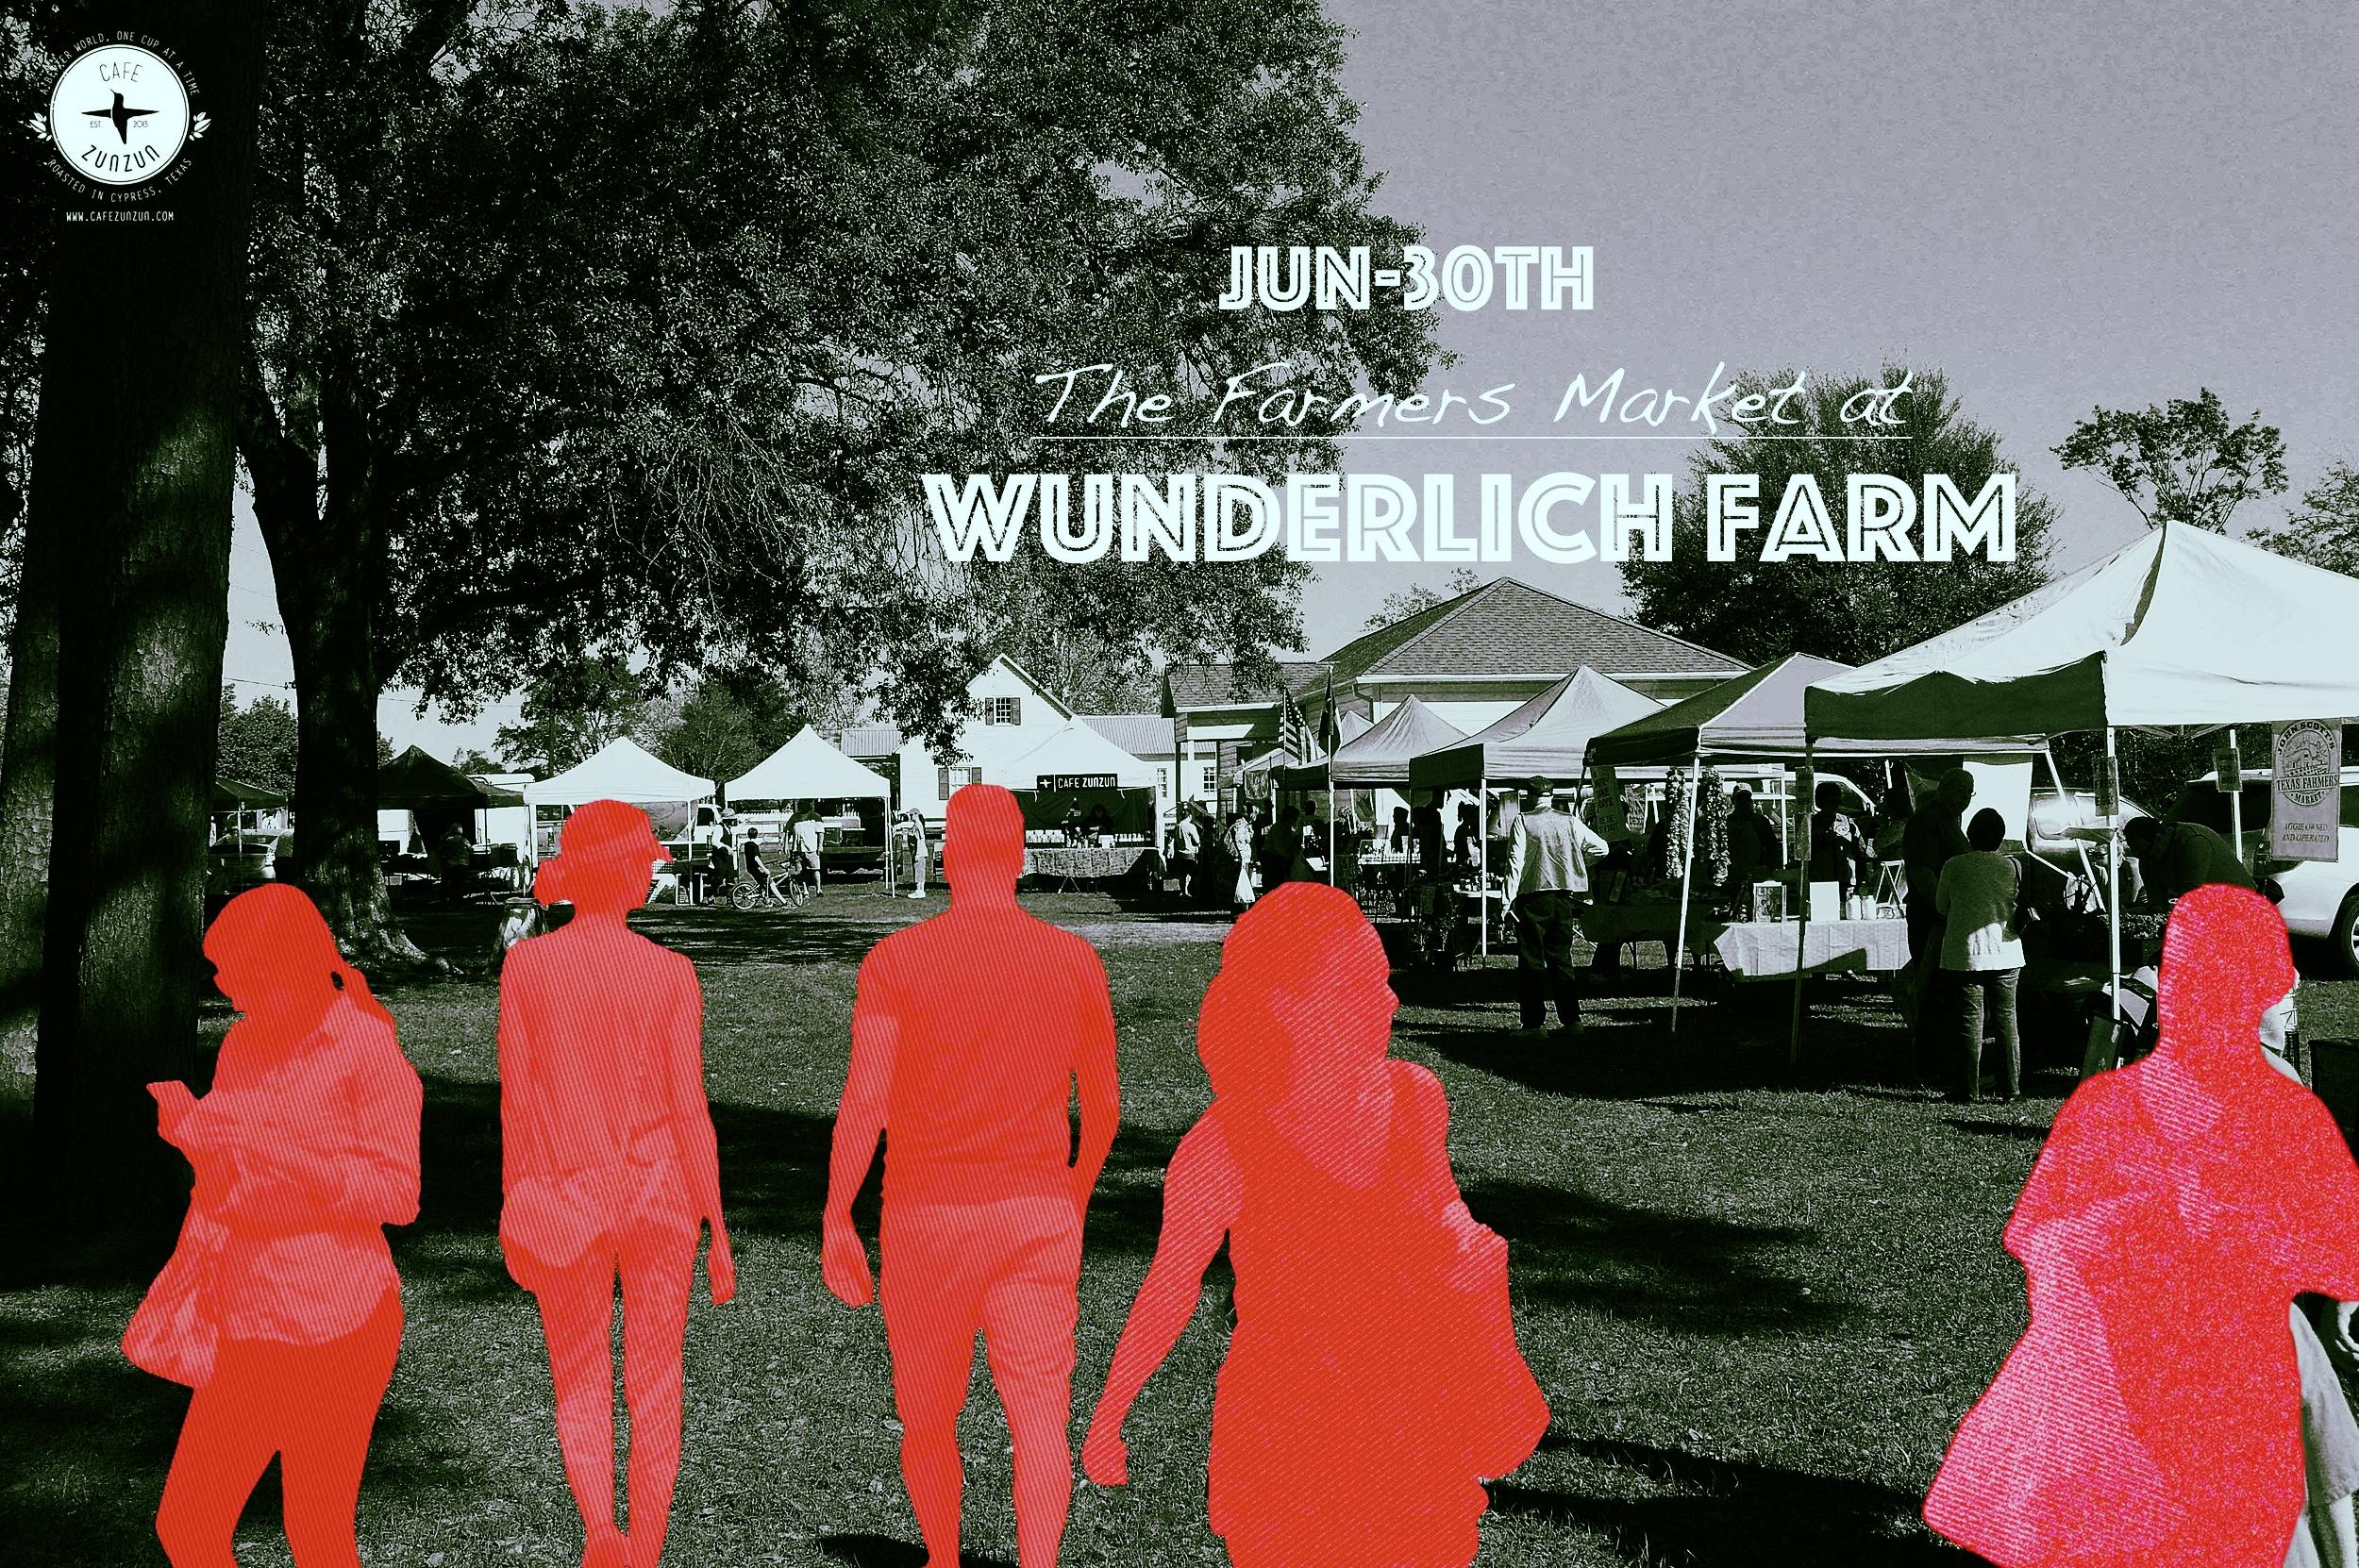 WUNDERLICH FM  JUN-30TH:18.jpg